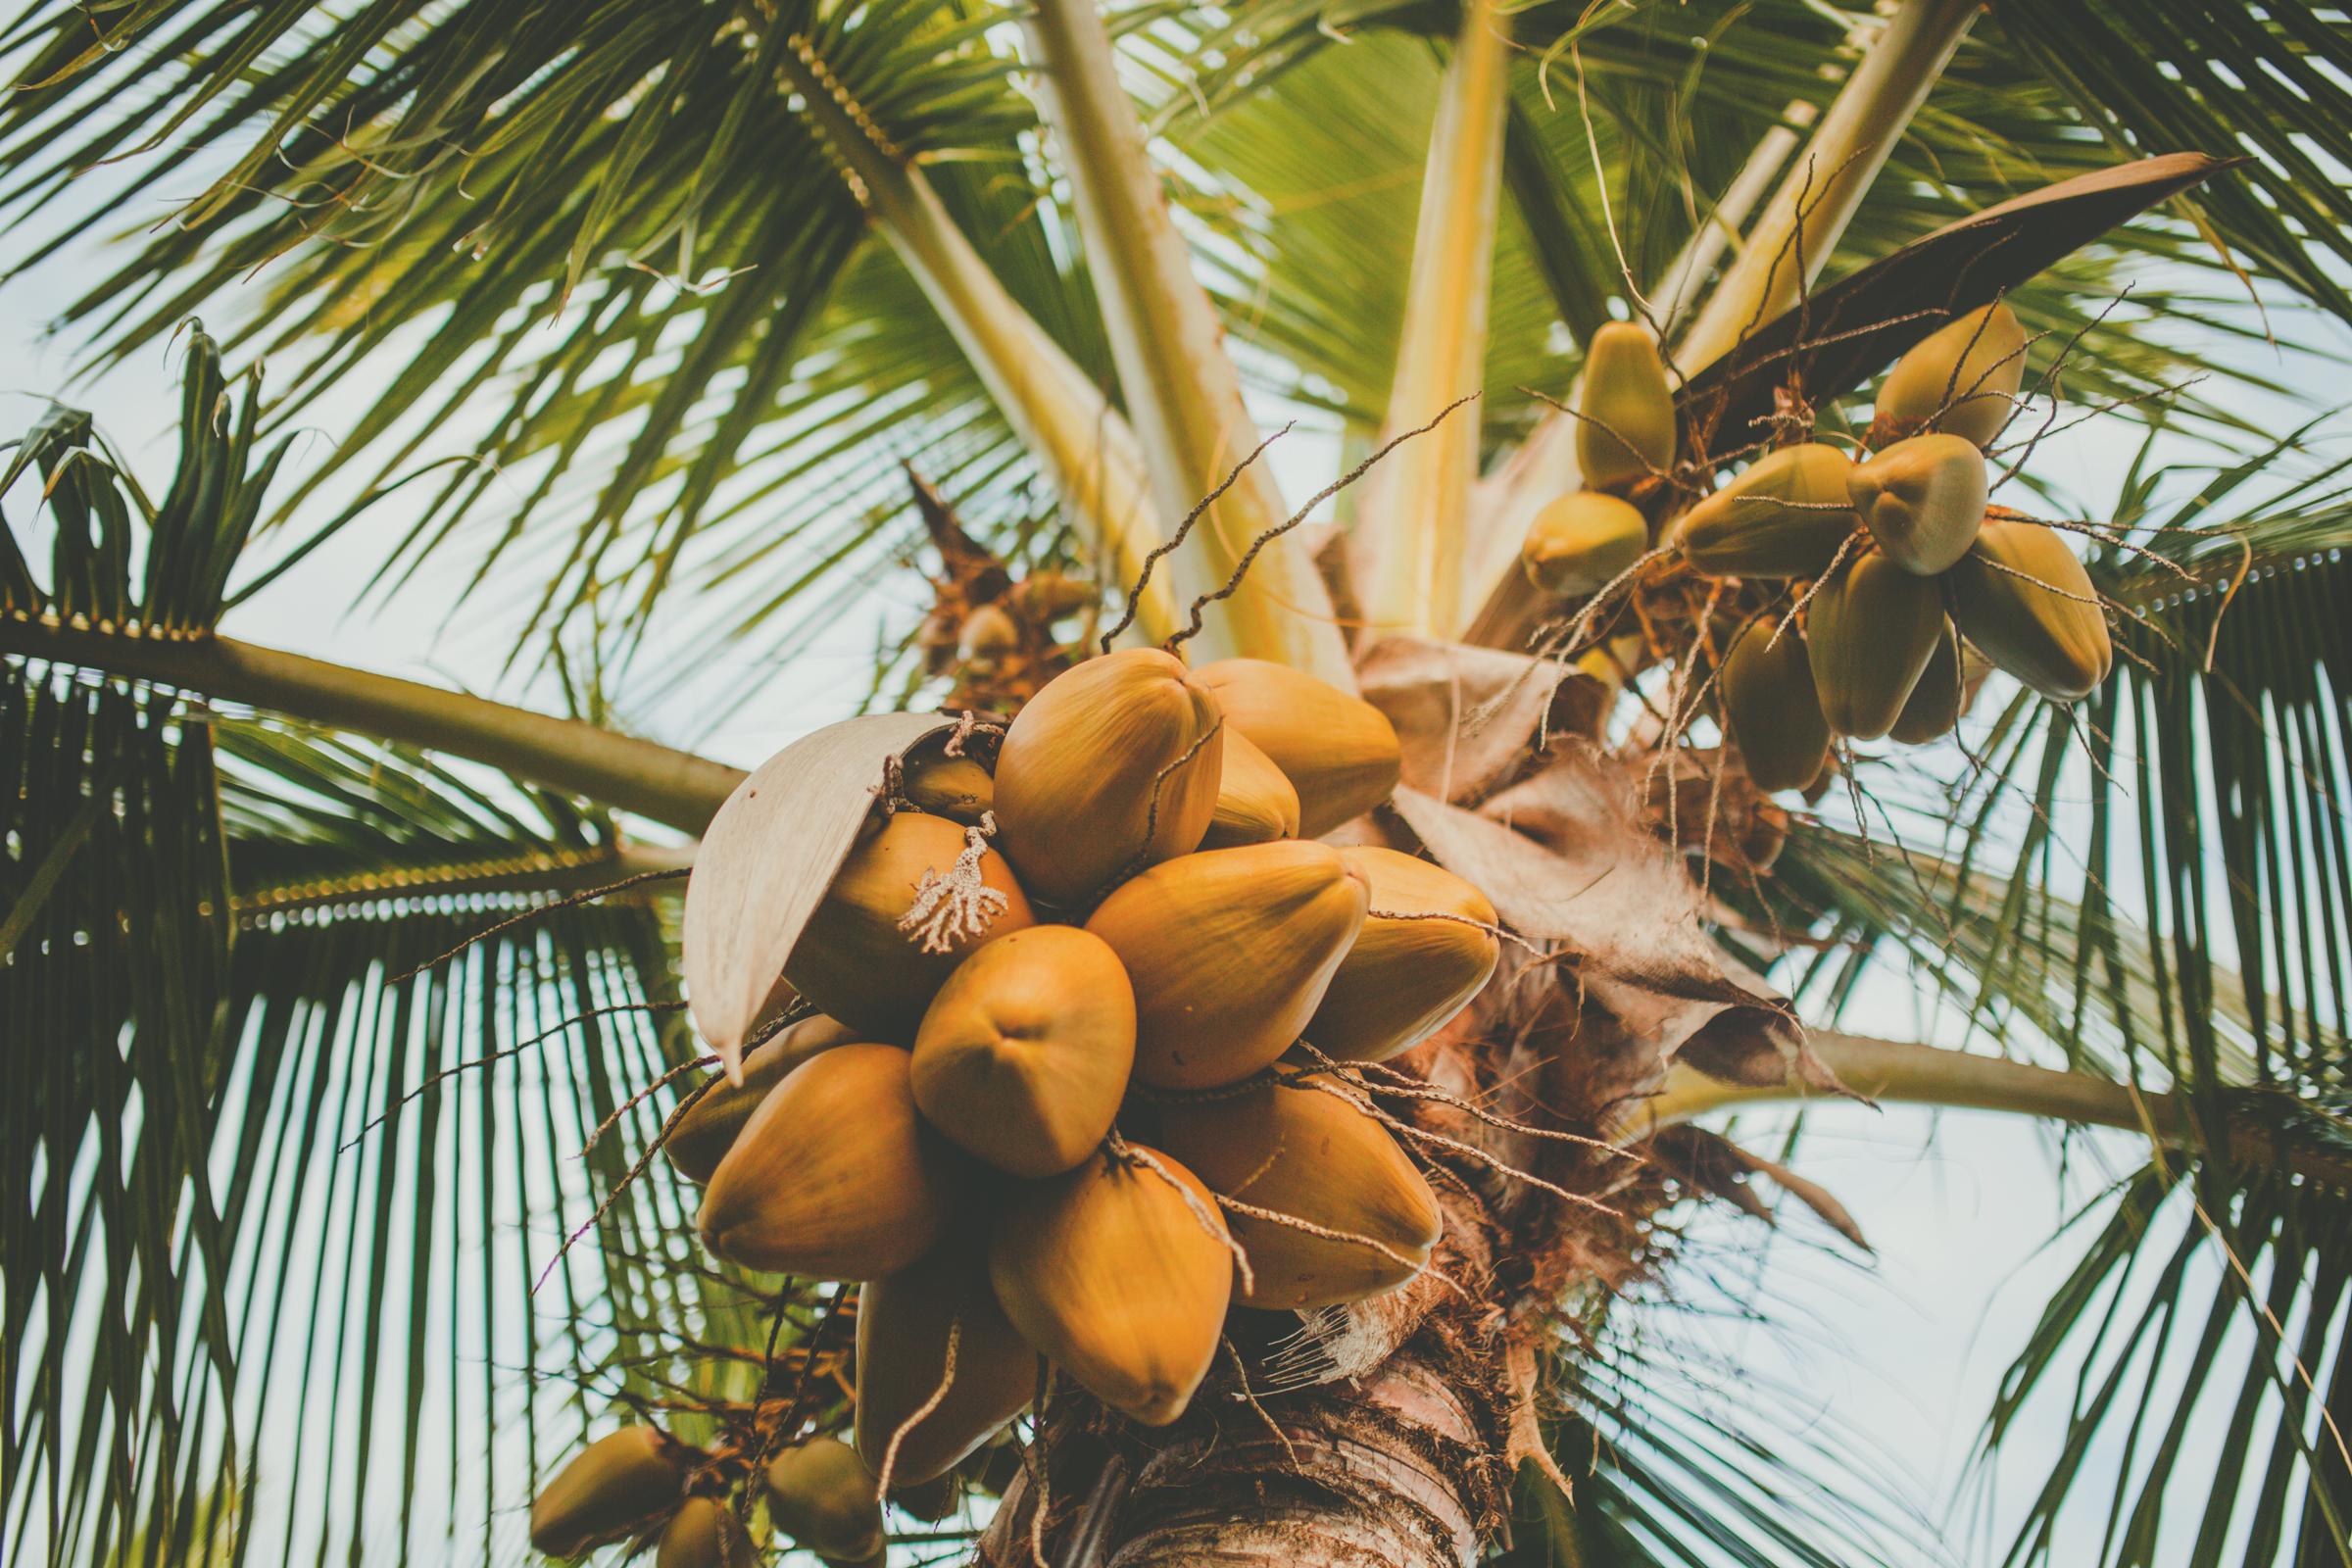 IMG_2995--KAUAI-HAWAII-JENNIFER-PICARD-PHOTOGRAPHY.jpg